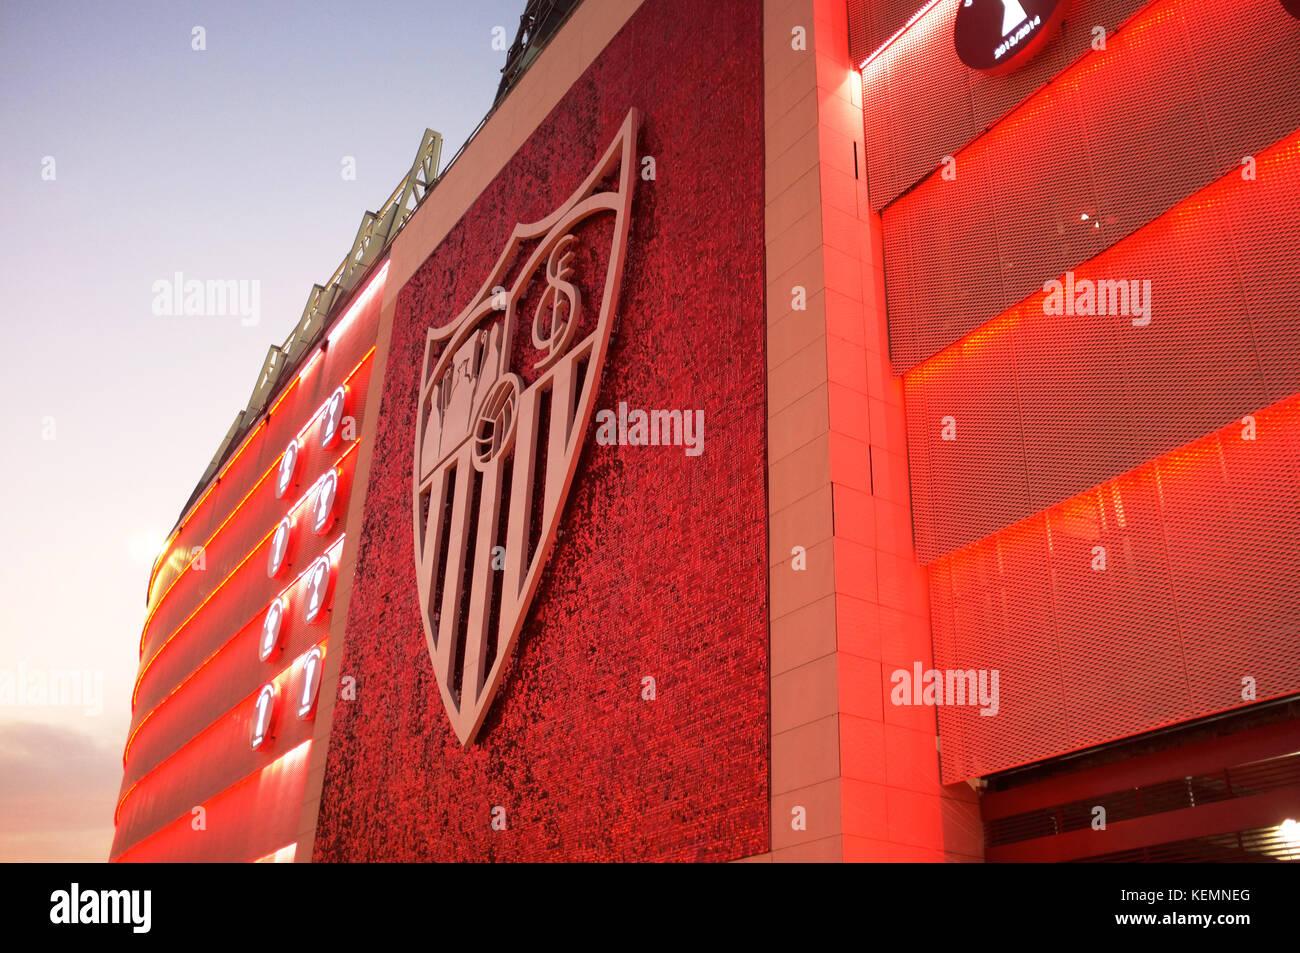 Exterior of the Ramón Sánchez Pizjuán Stadium, Sevilla FC vs Las Palmas, Seville, Andalucia, Spain, - Stock Image